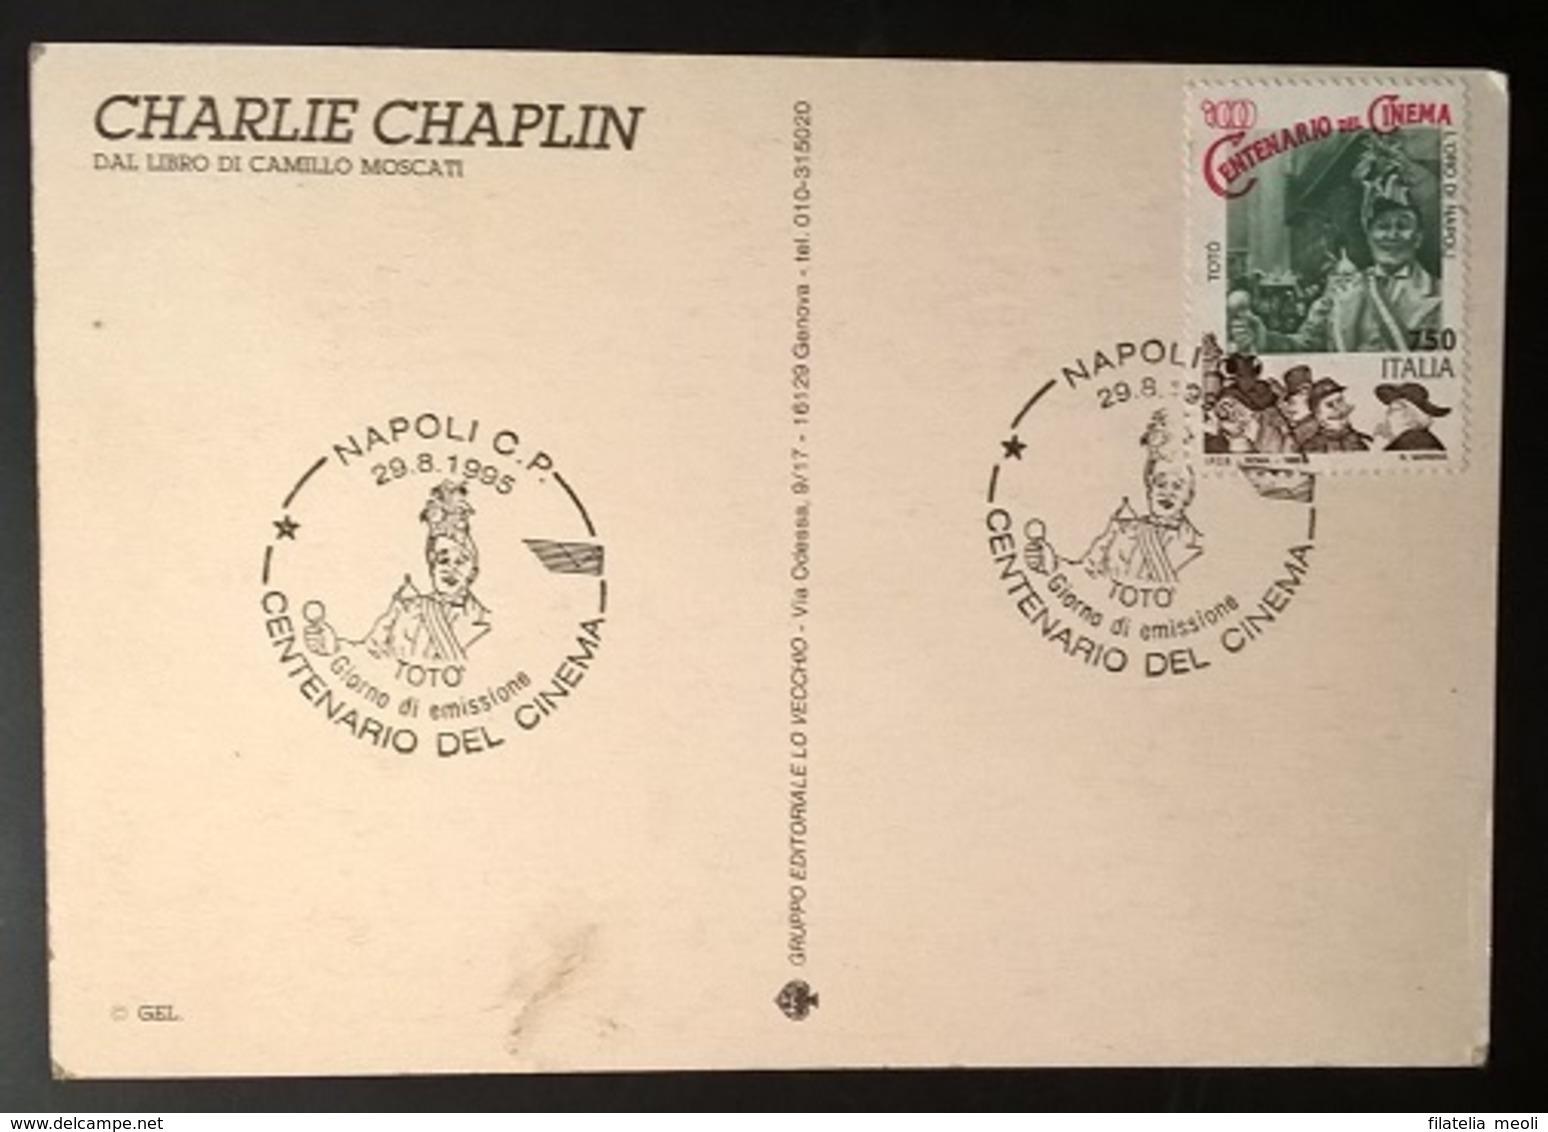 CARTOLINA CHARLIE CHAPLIN - Cinemania